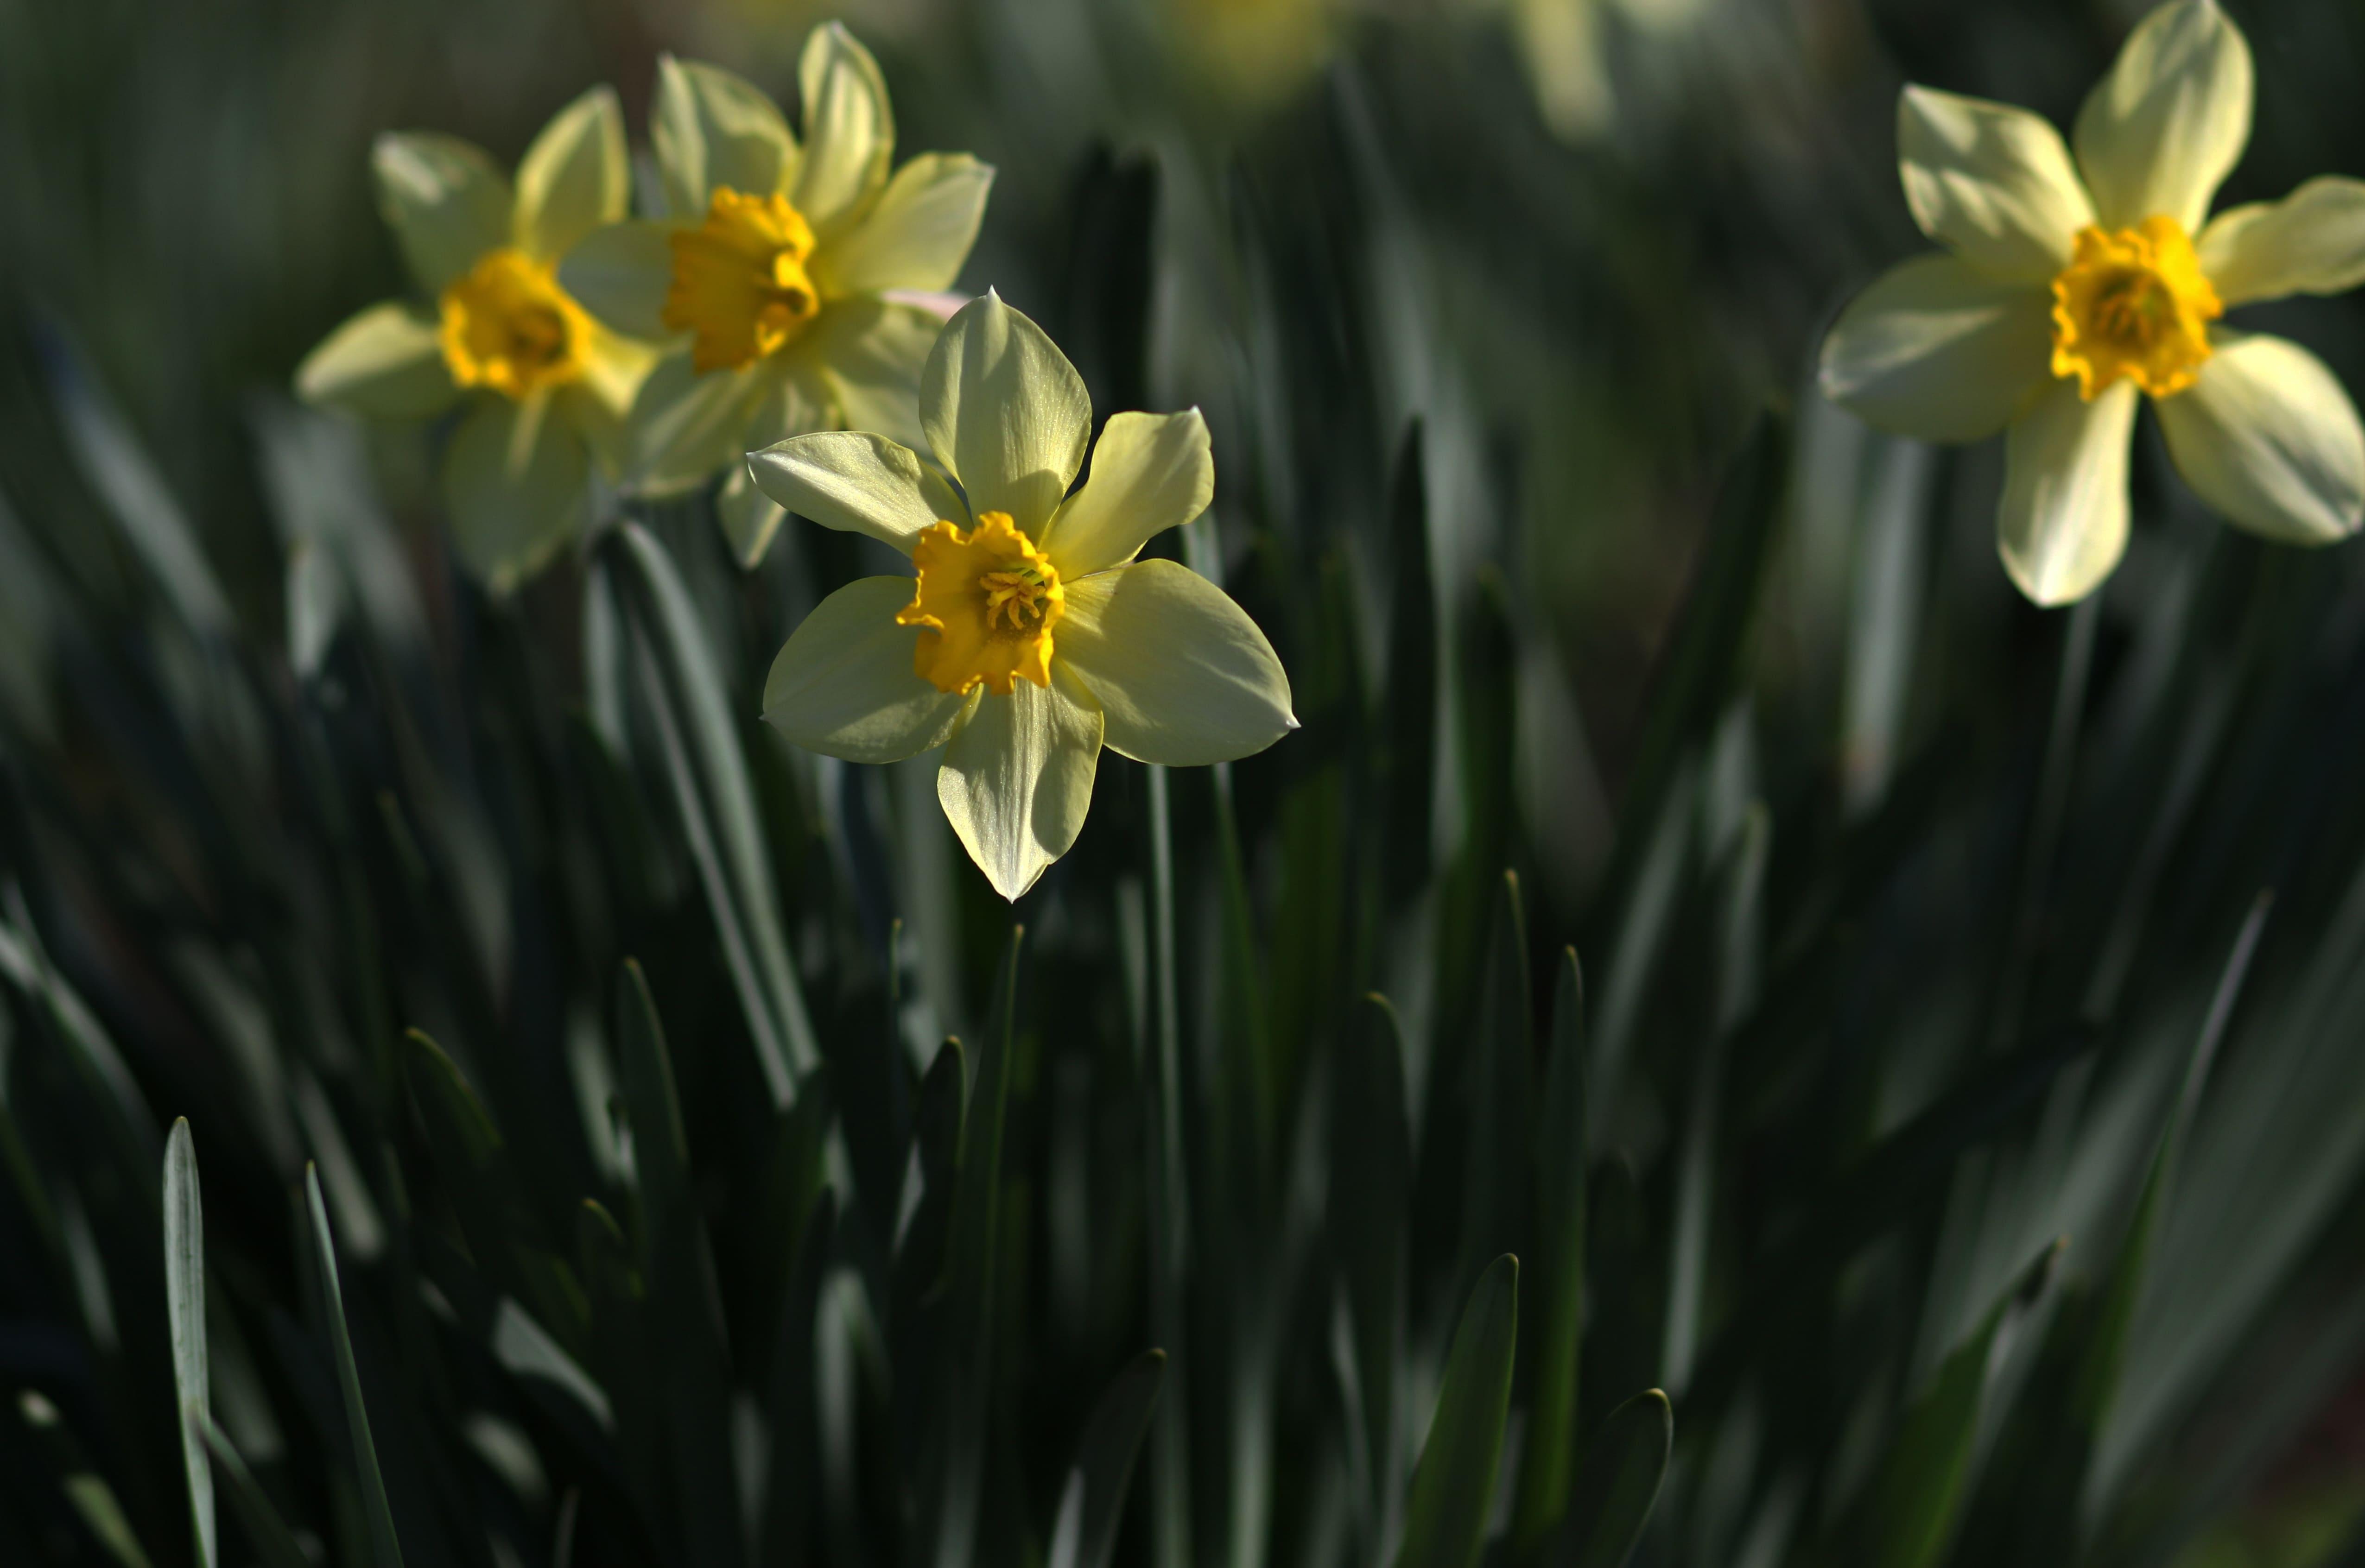 daffodils-photo-43